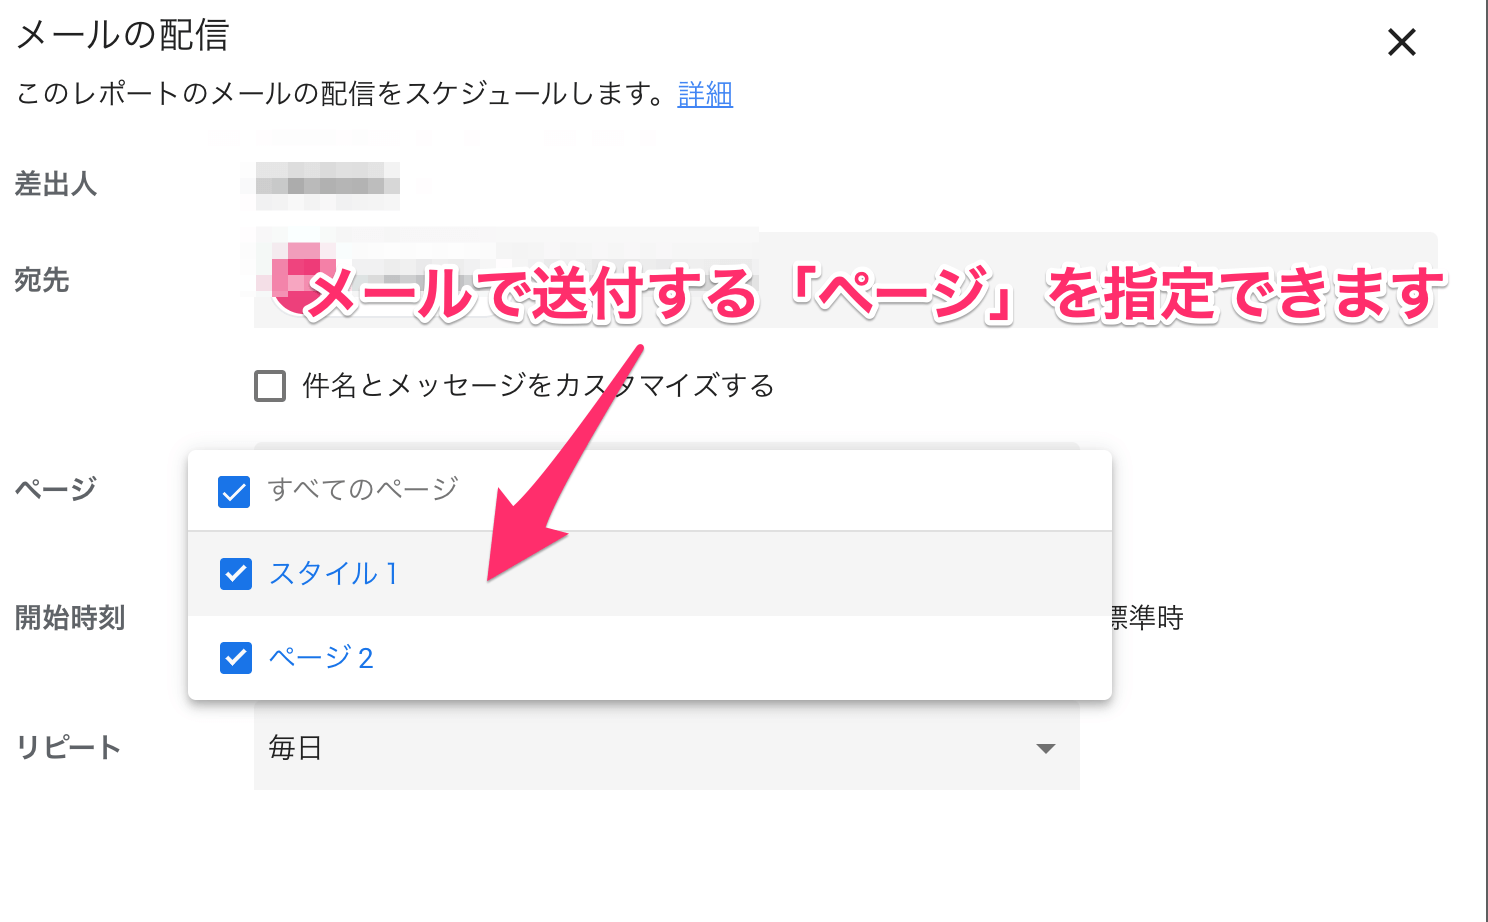 【Googleデータポータル】メール配信の設定方法。最新のダッシュボードを「プッシュ型」で届けられる